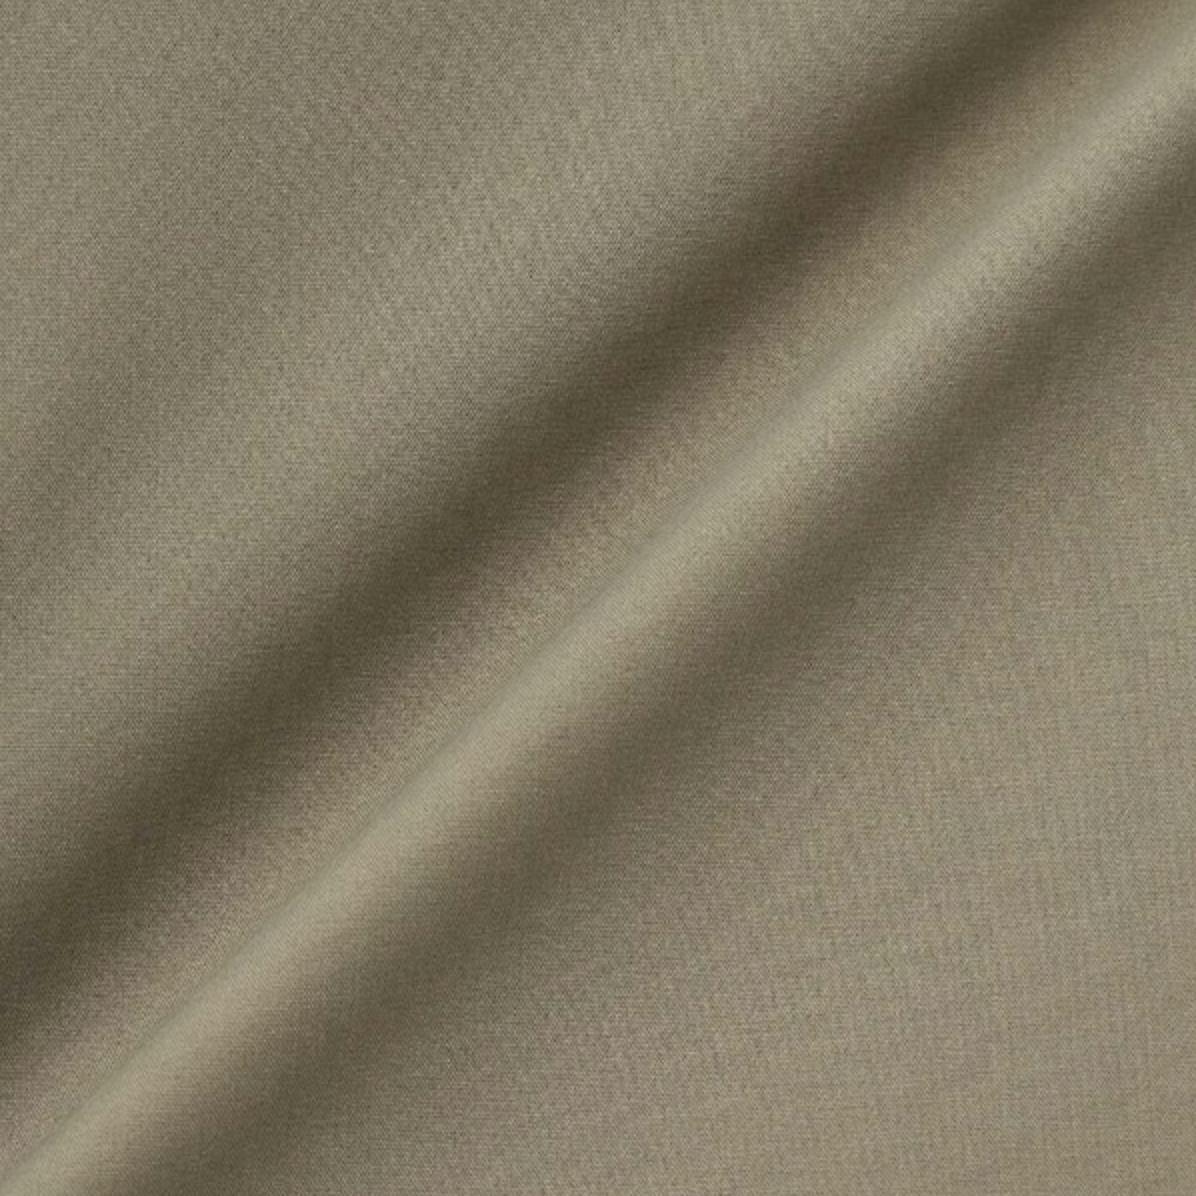 f:id:yamada0221:20210402114931p:plain